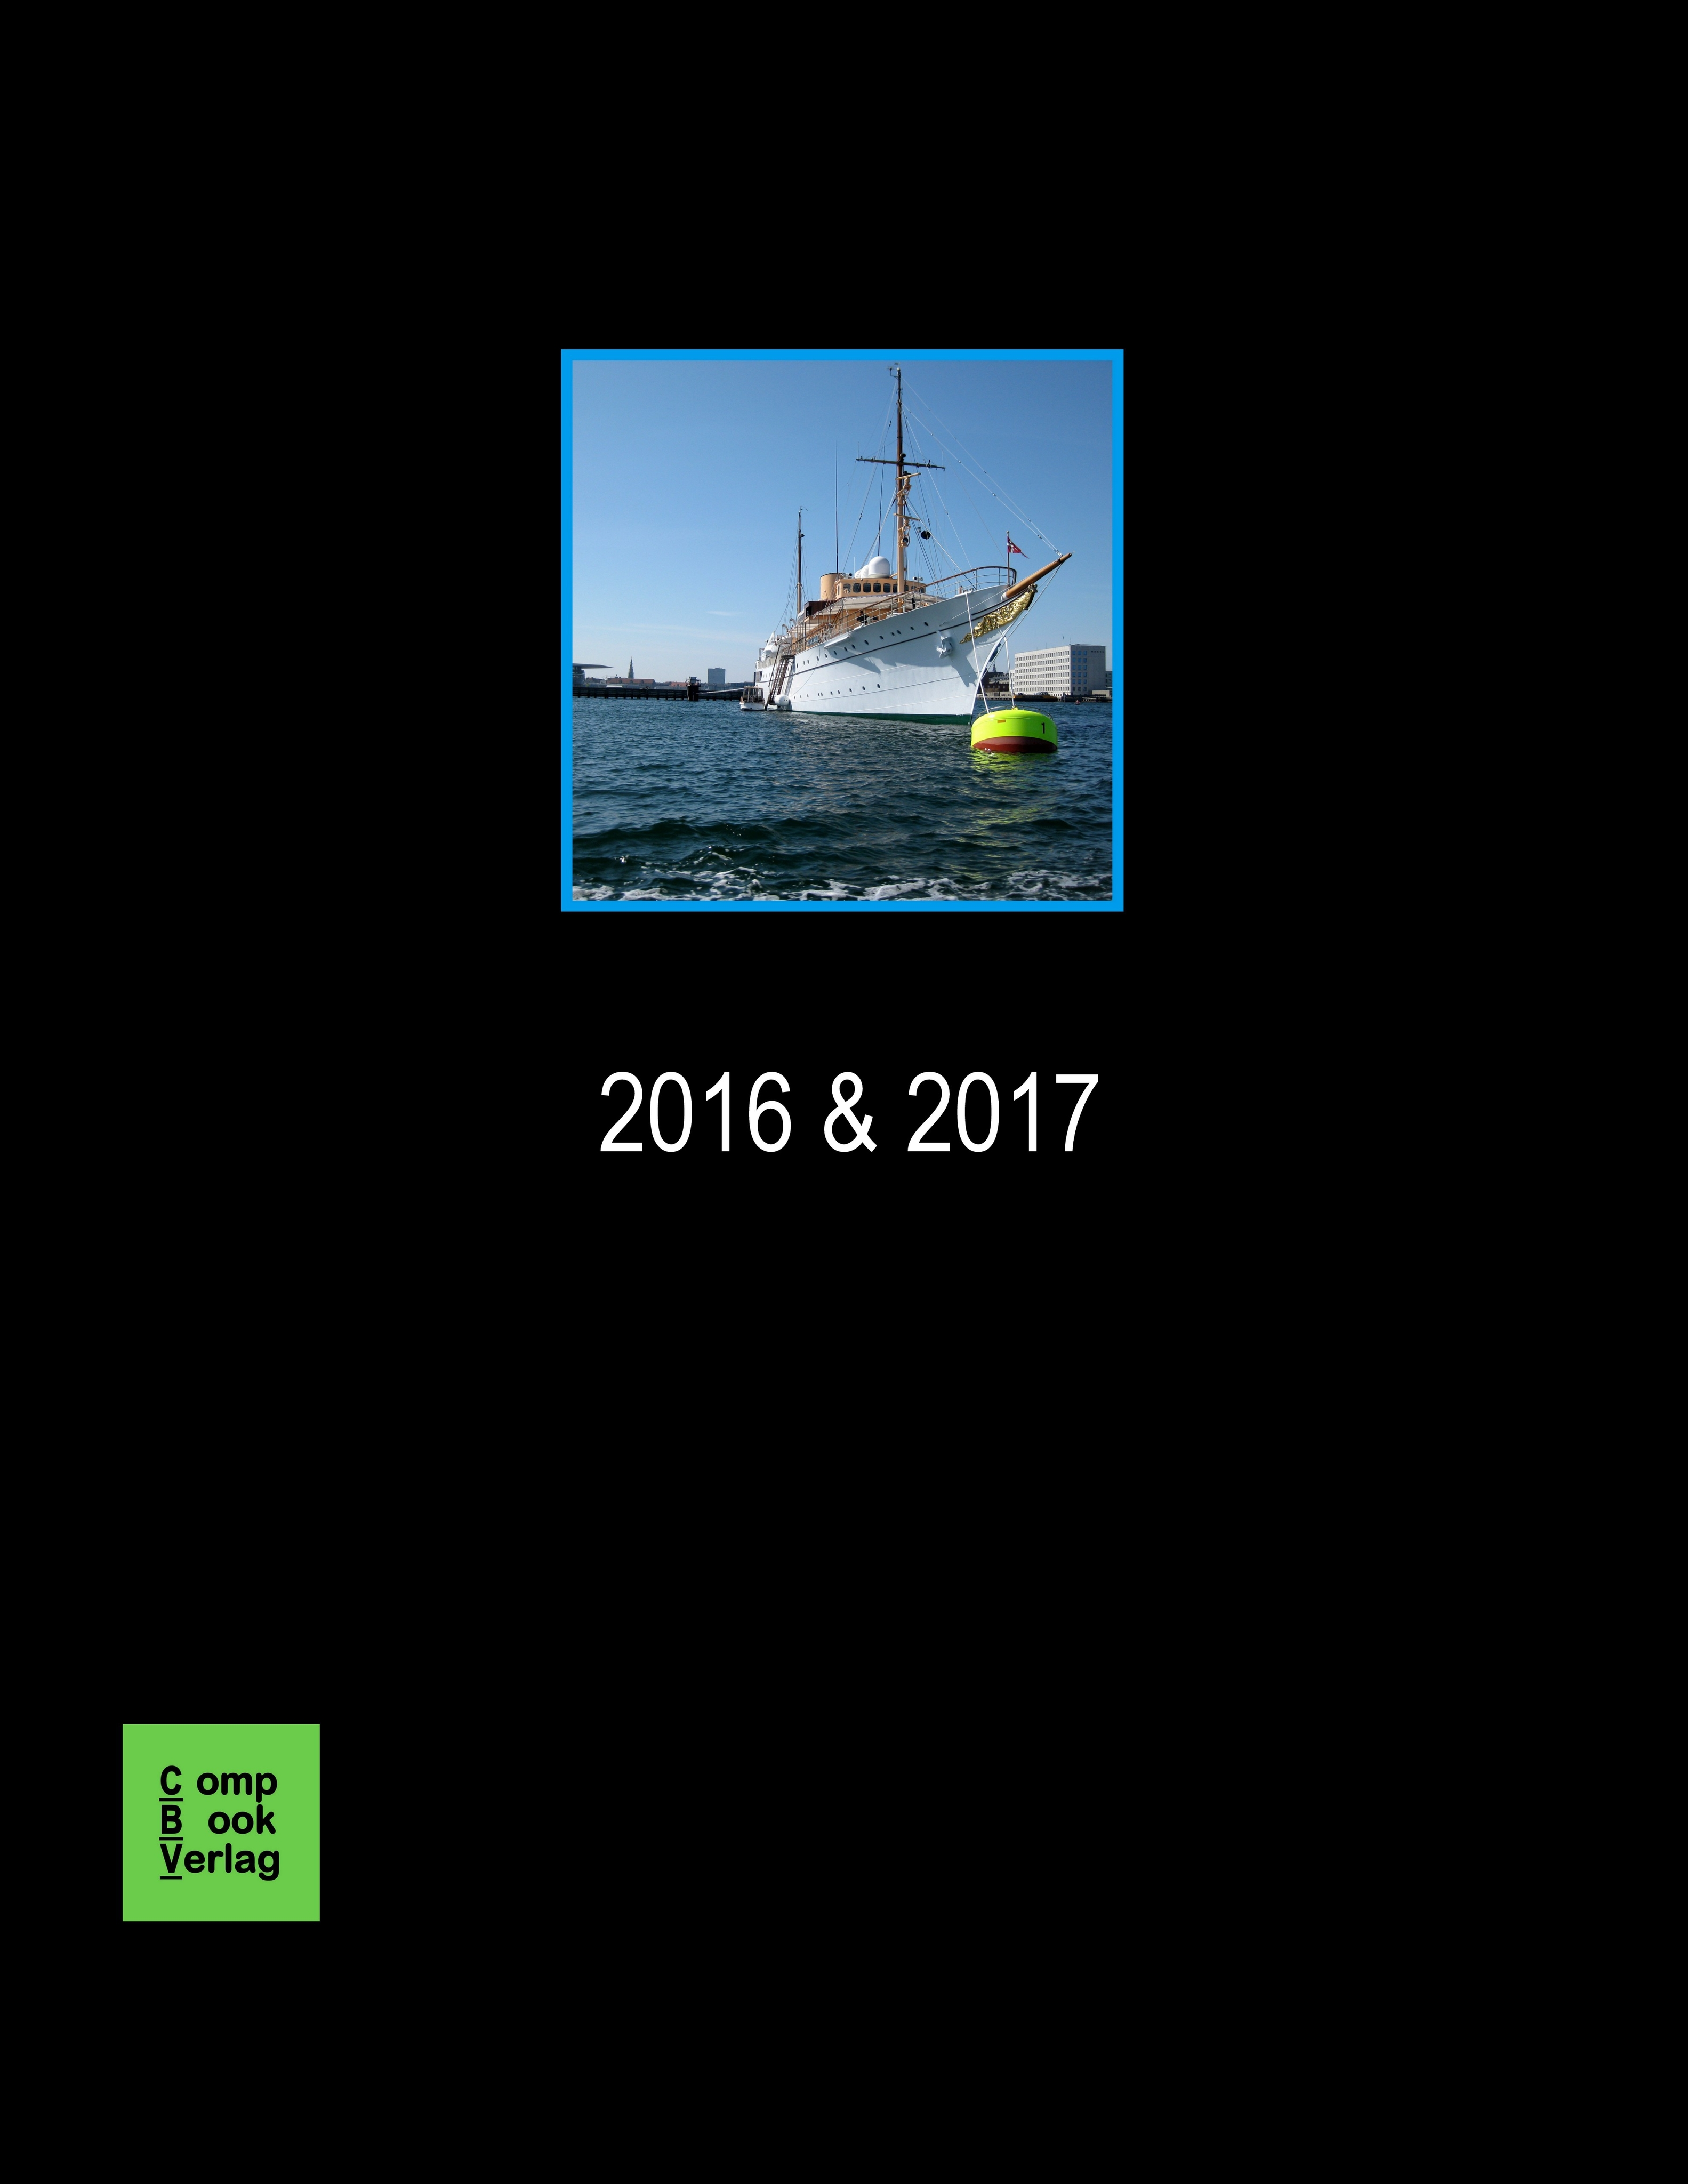 2016-2017-Verlag-Compbook-9783934473607